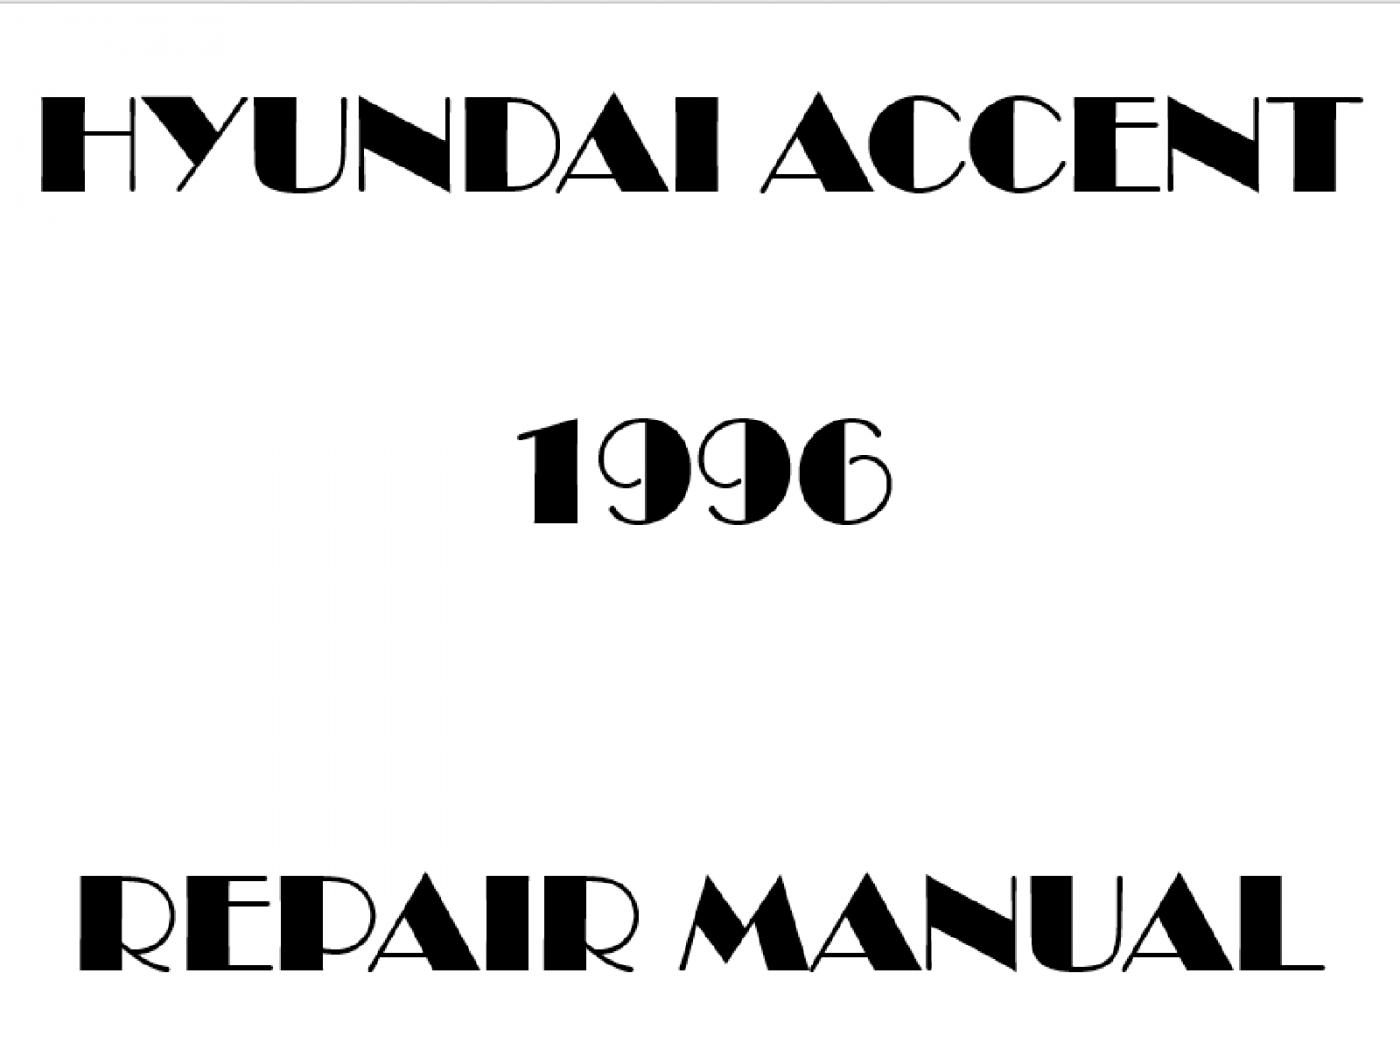 1996 Hyundai Accent repair manual